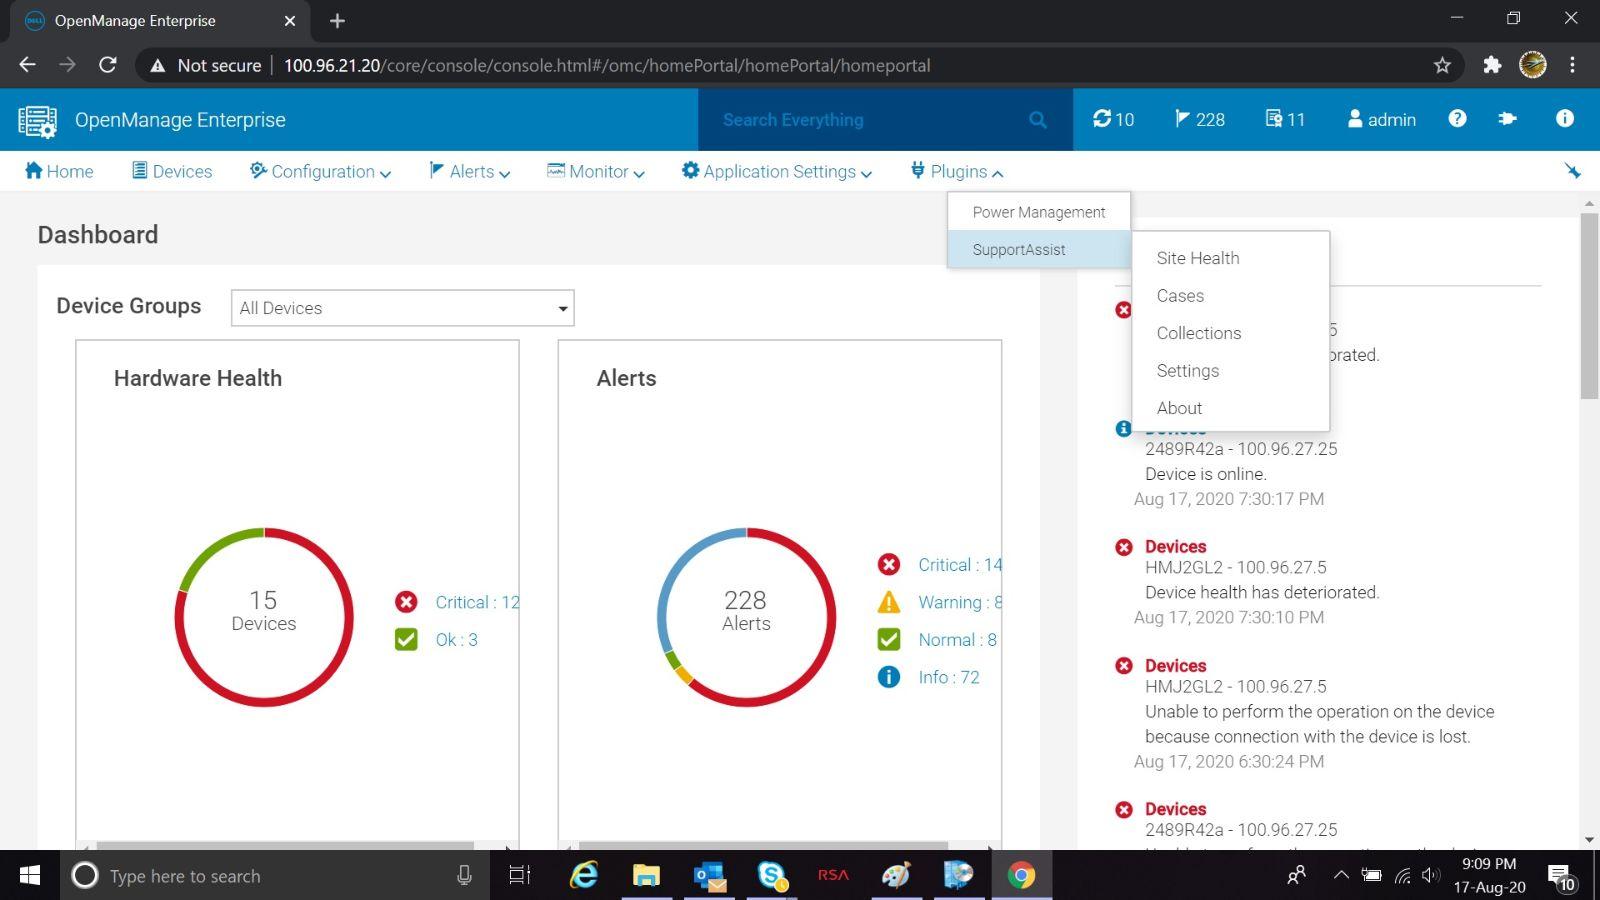 Dell EMC OpenManage Enterprise SupportAssist Menüsü